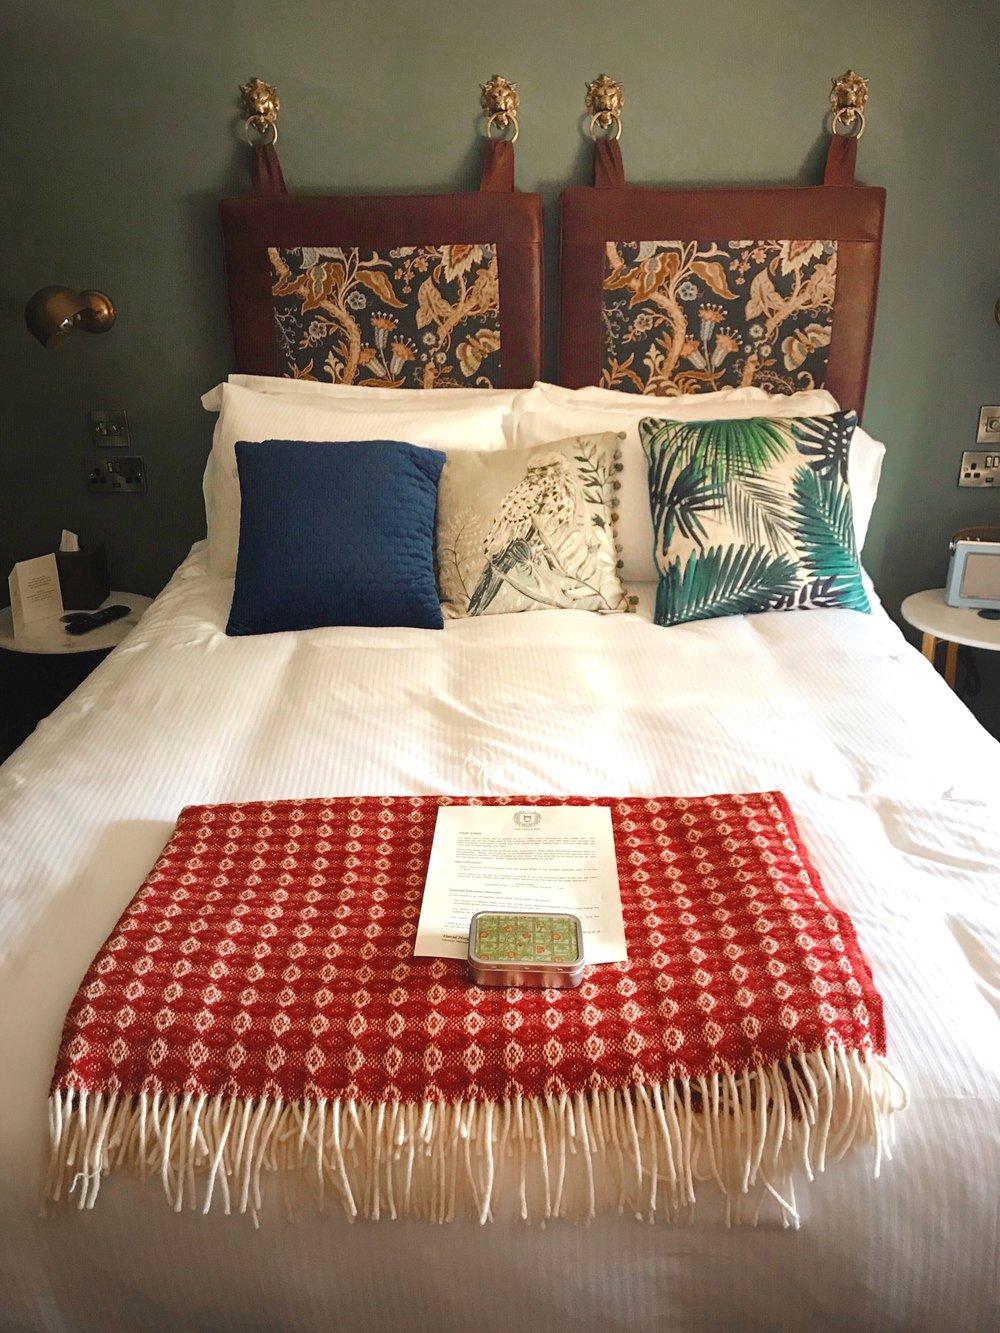 Where to stay in Lulworth, The Castle Inn, West Lulworth, Dorset